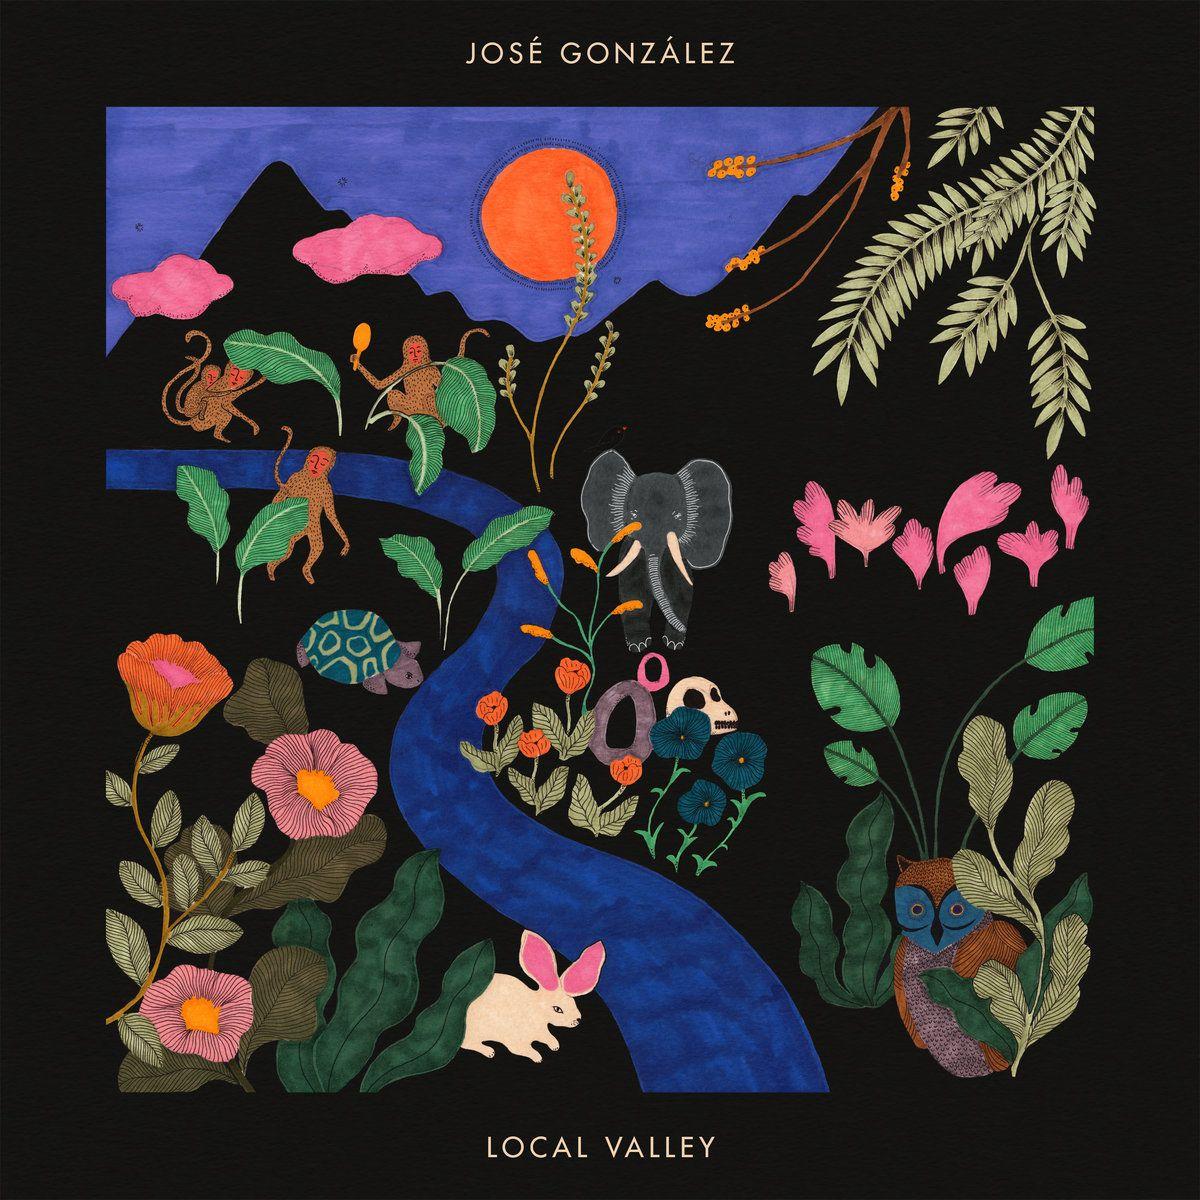 José González - Local Valley - LP